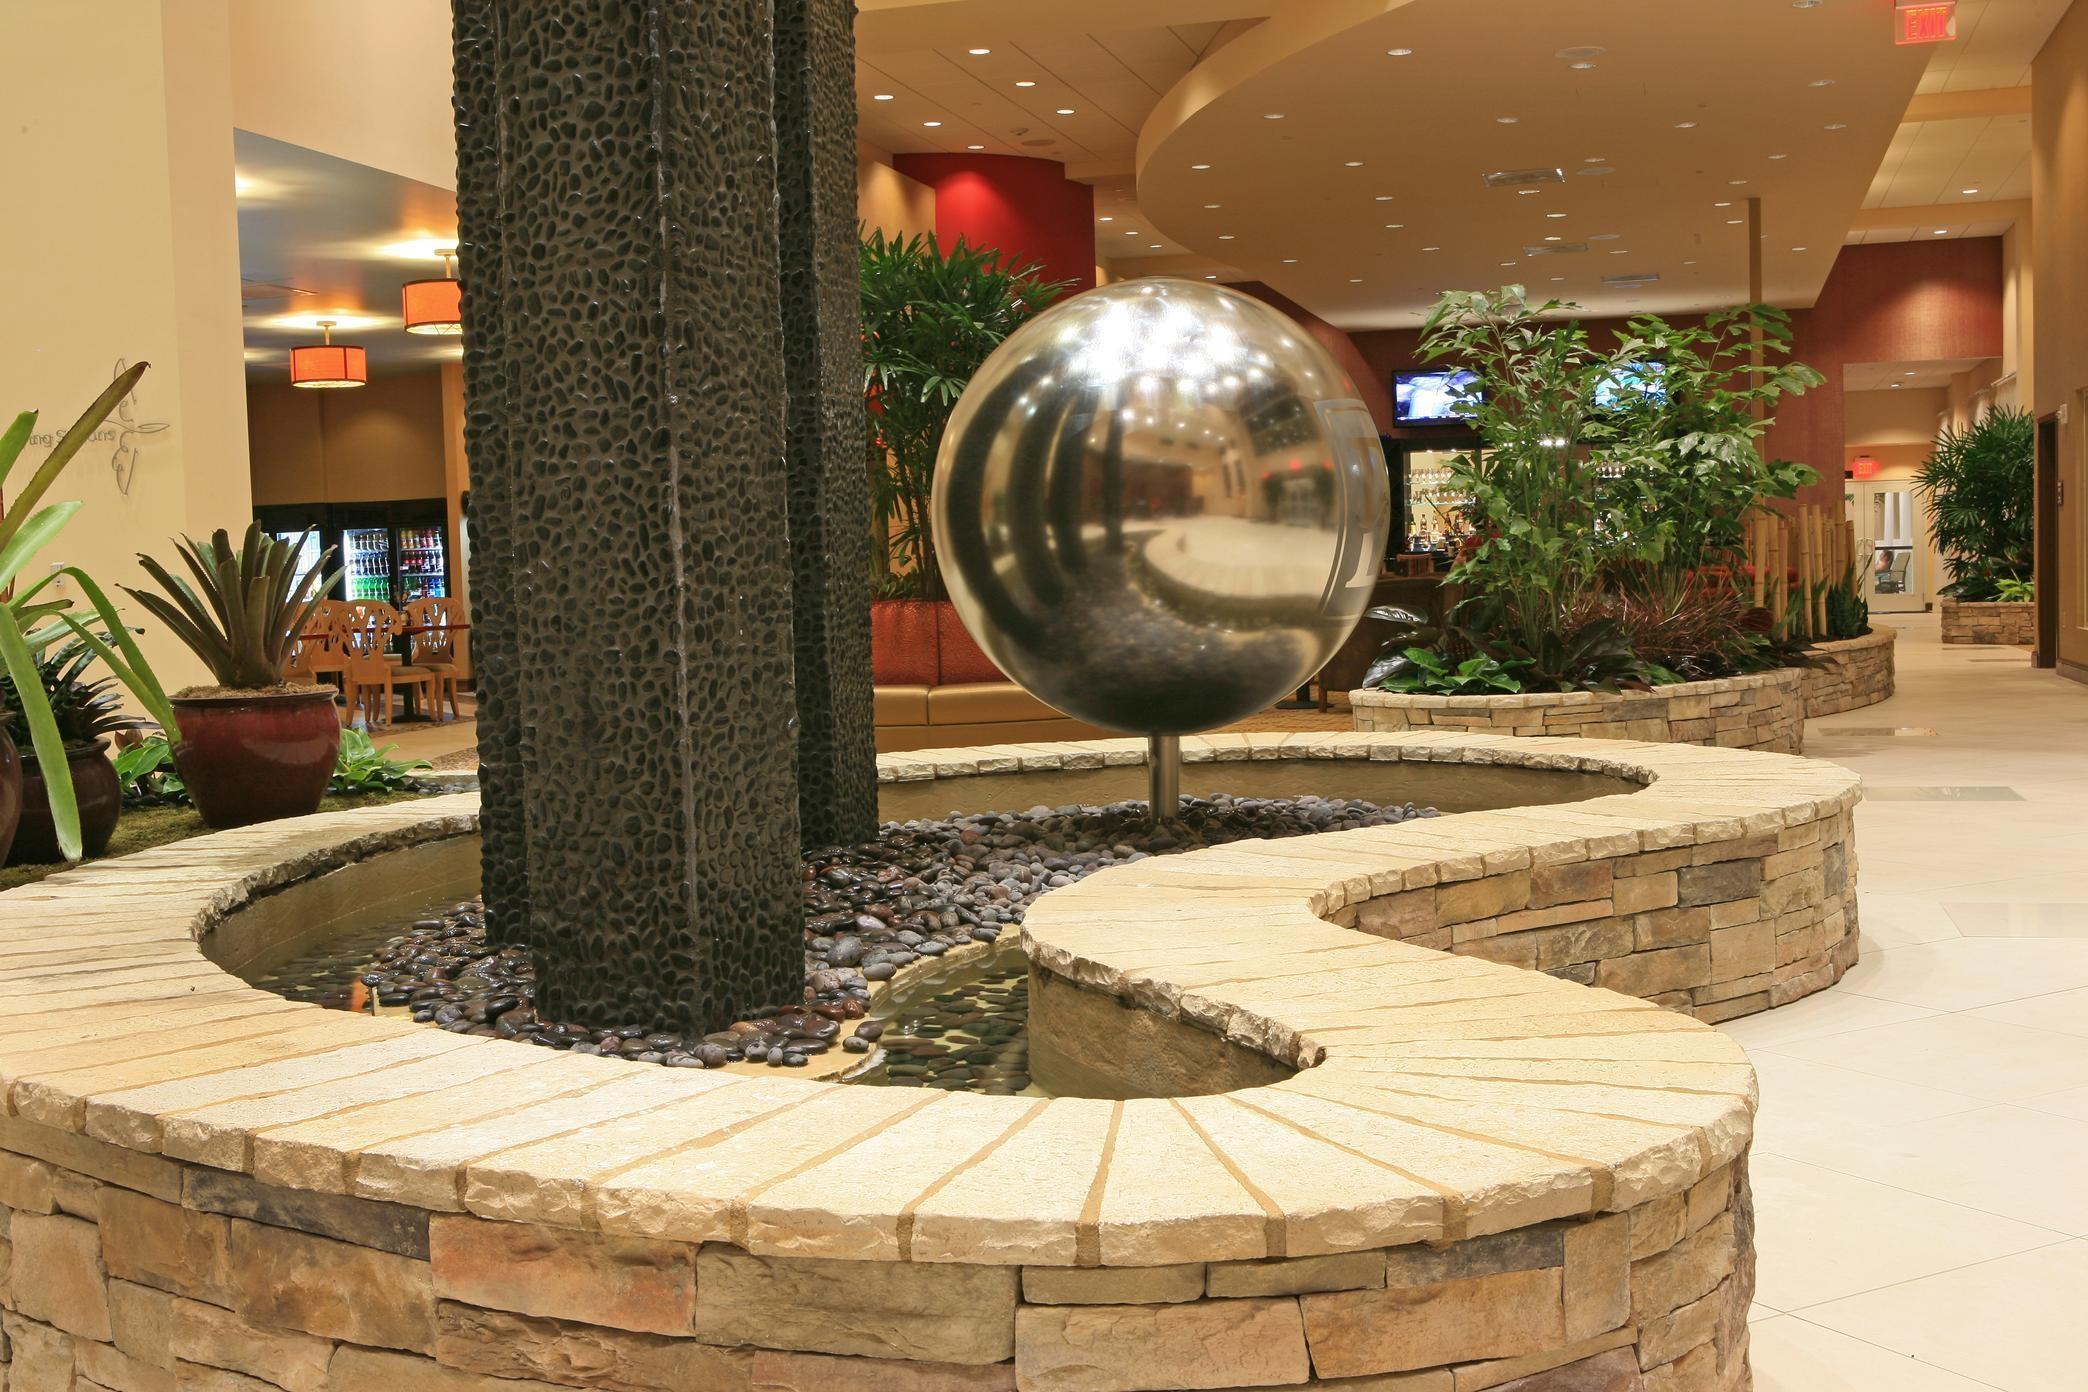 Embassy Suites by Hilton Birmingham Hoover image 14